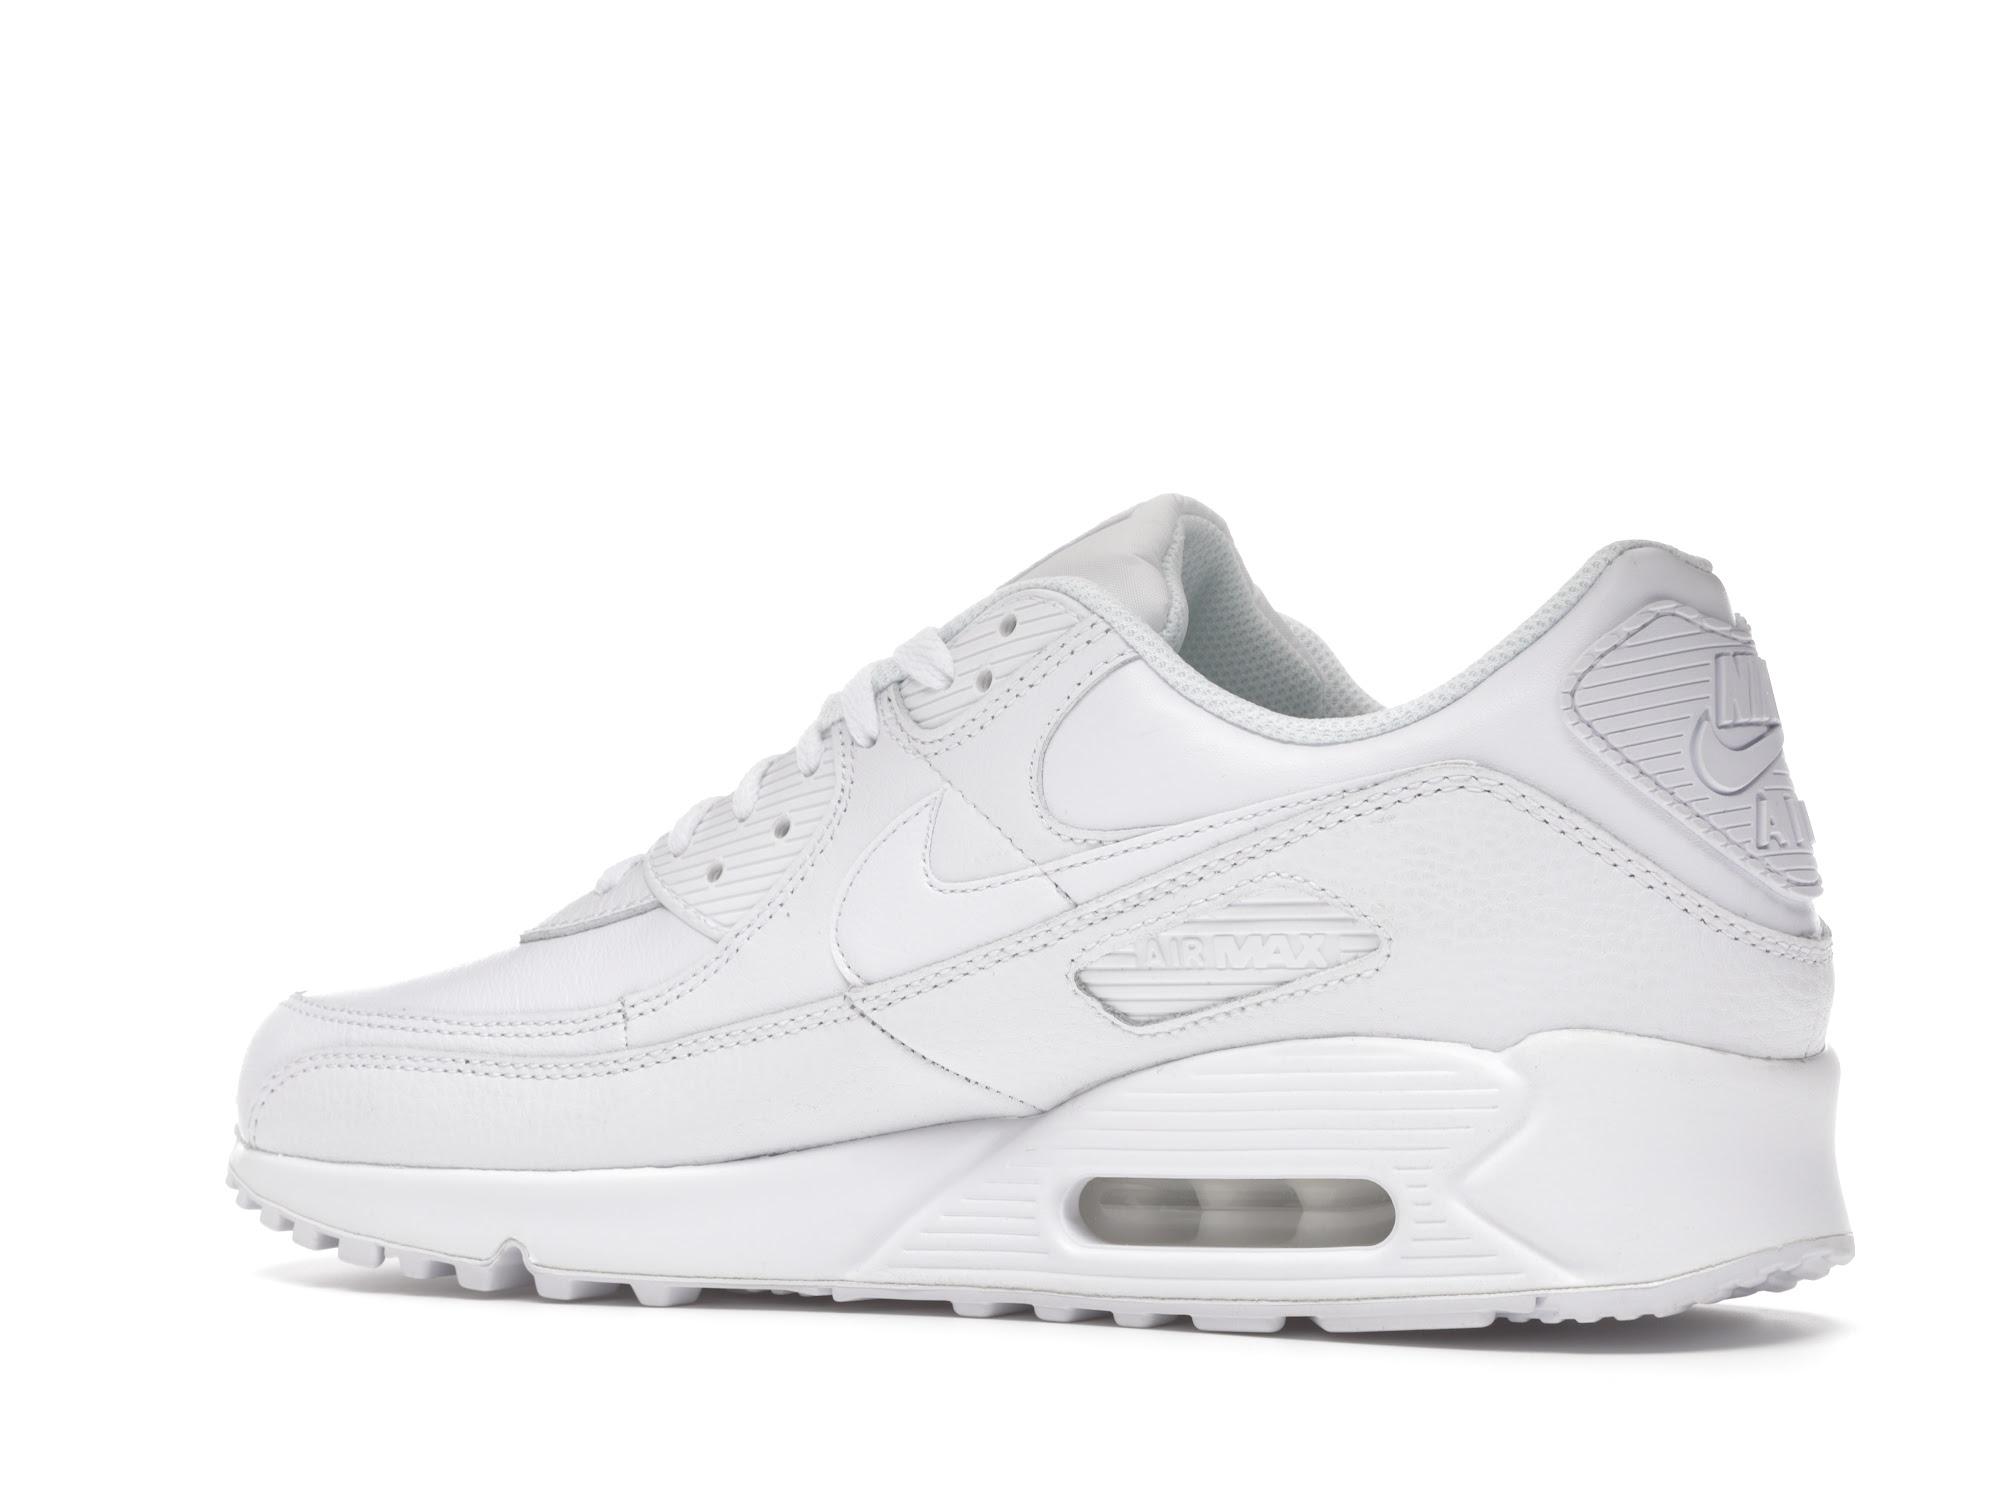 Nike Air Max 90 Leather Triple White (2020)